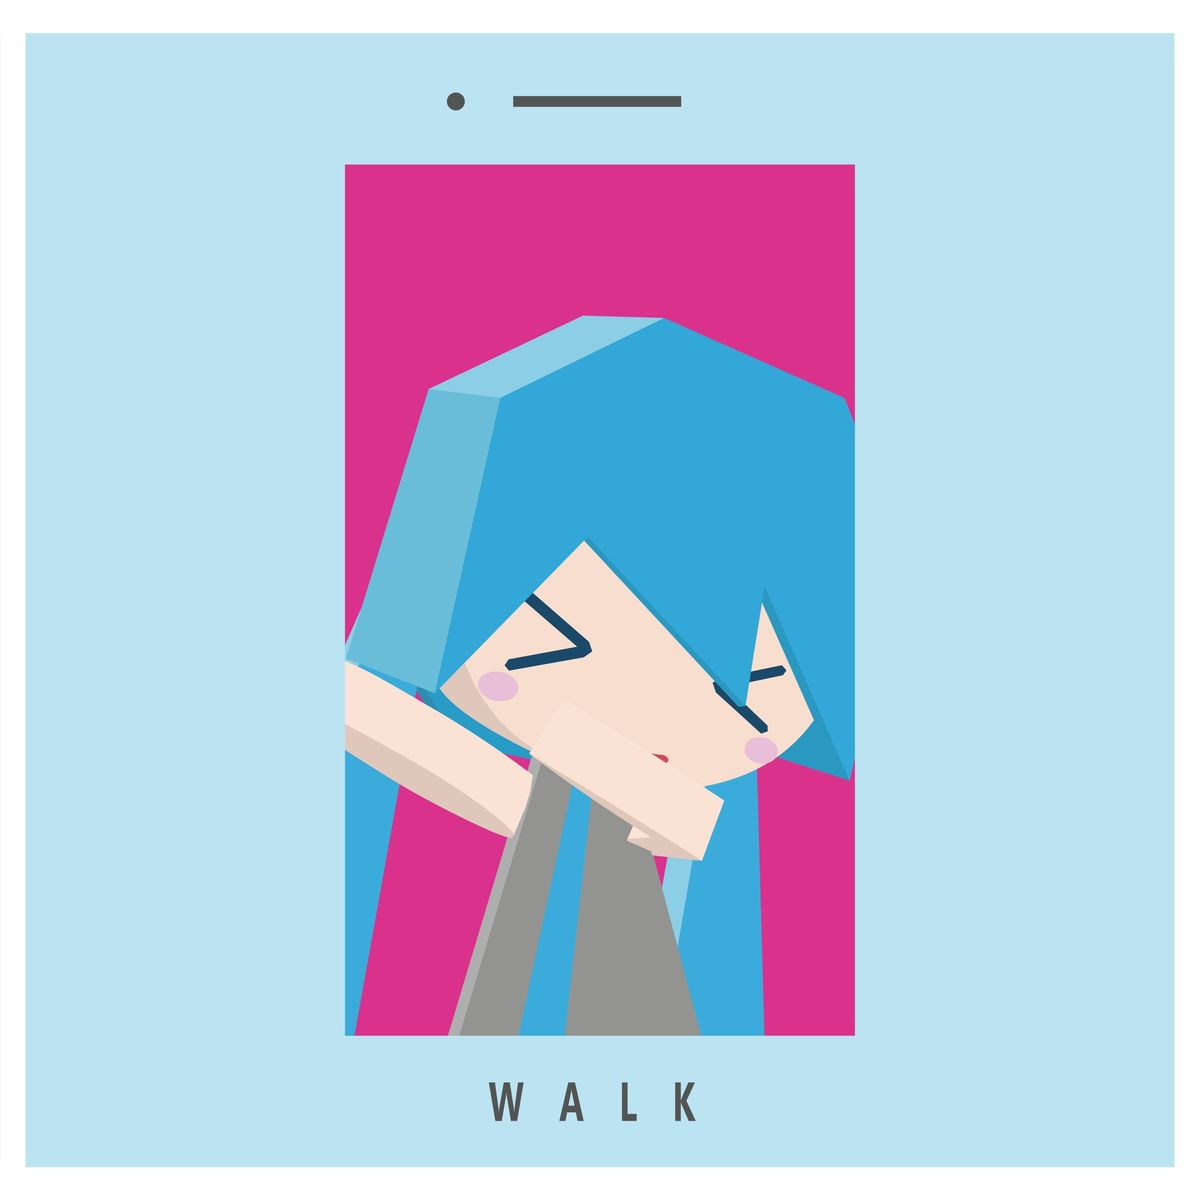 [23.EXE] [213MB] WALK [FLAC 44.1kHz/16bit]